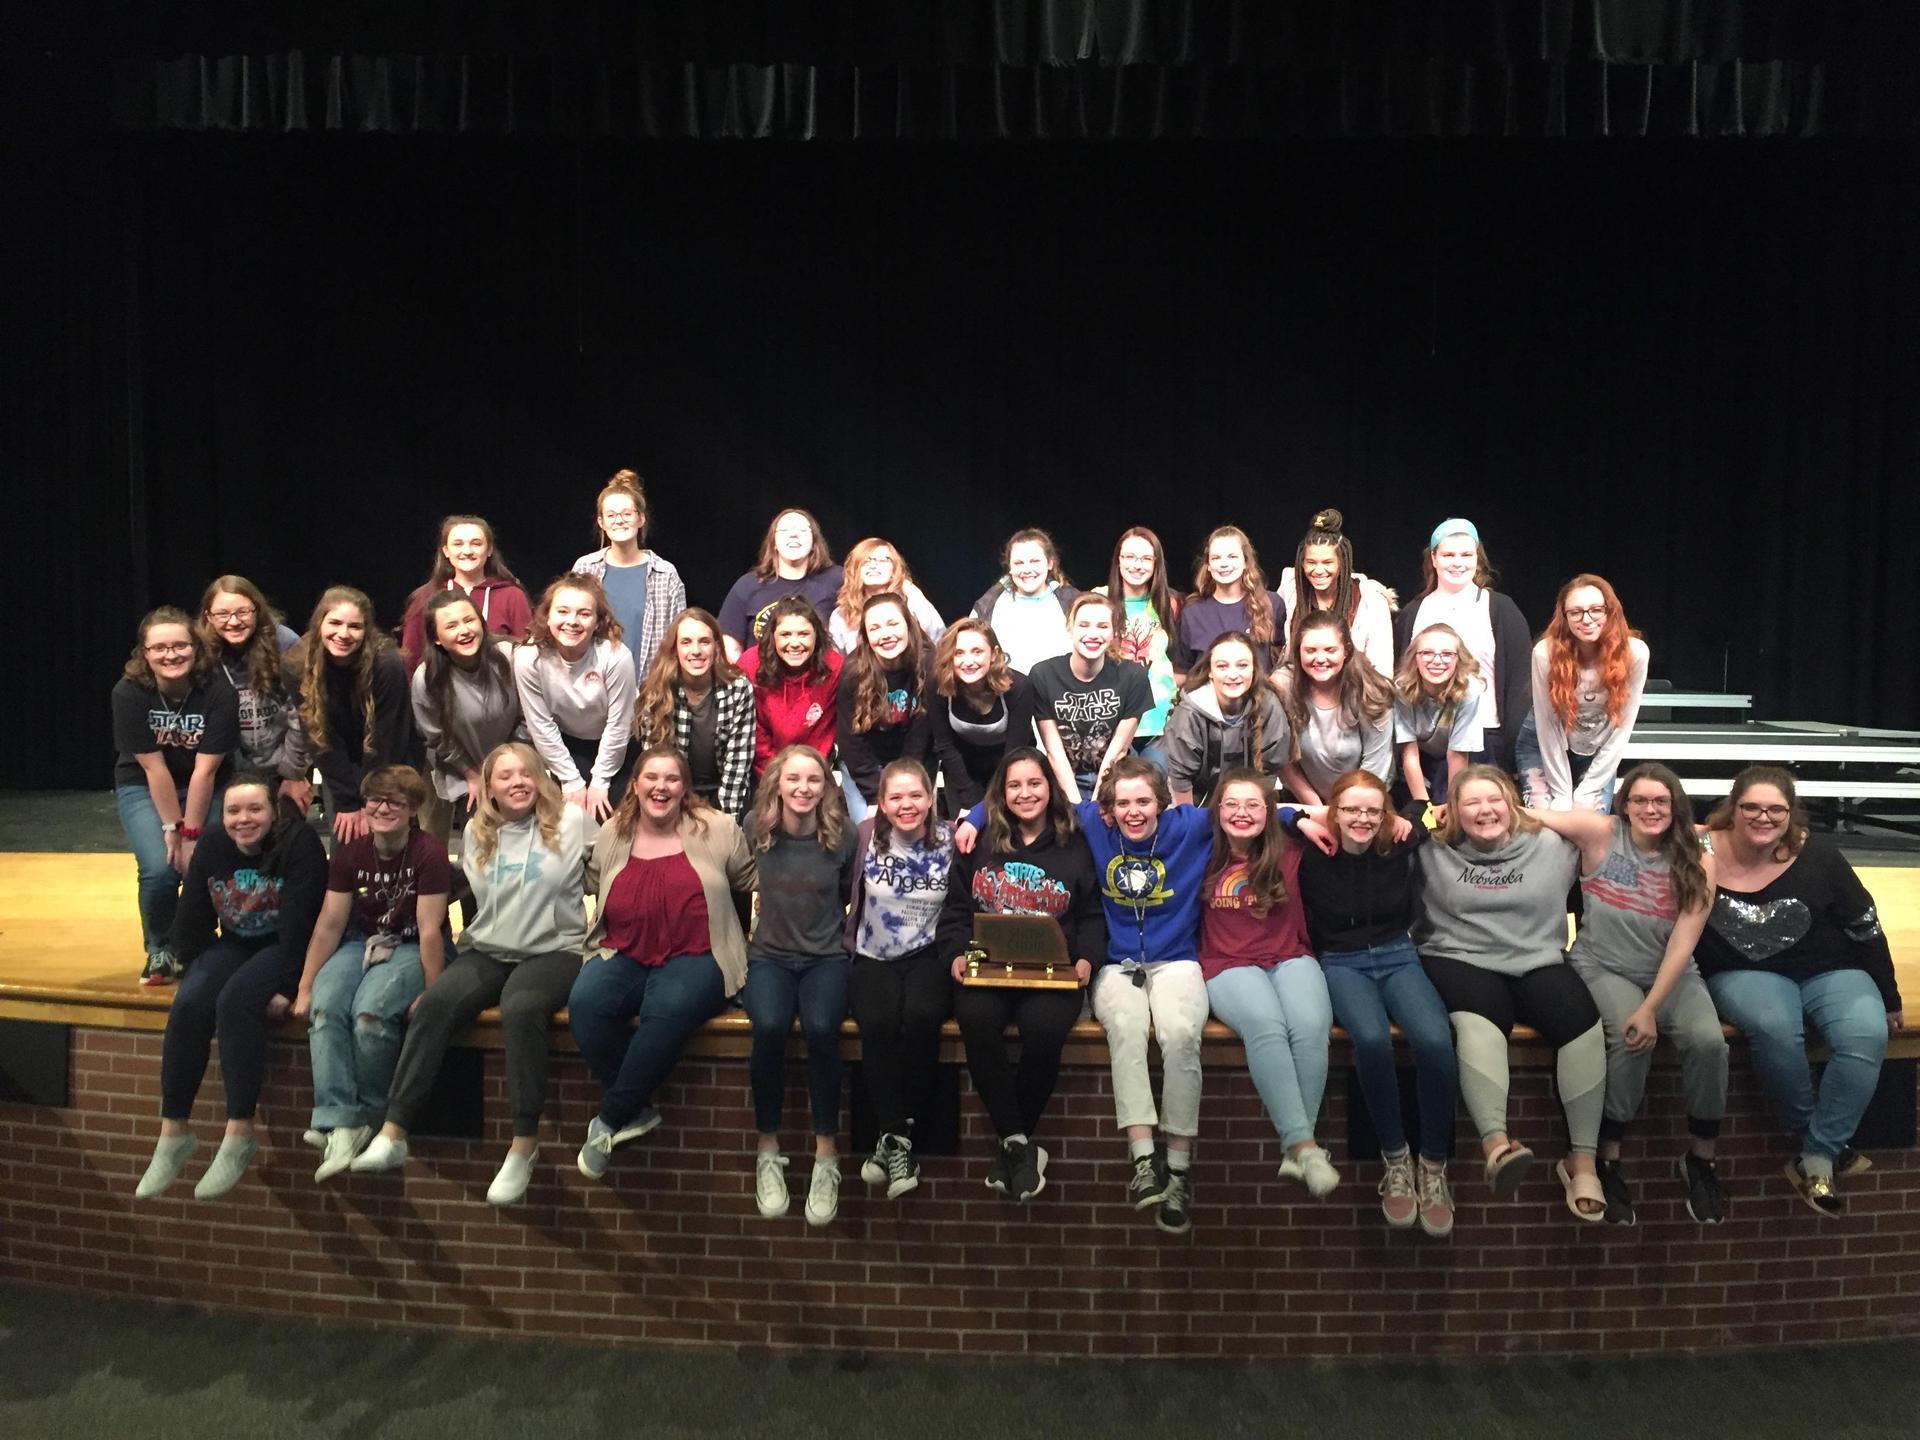 Group Photo of Award Winning Show Choir